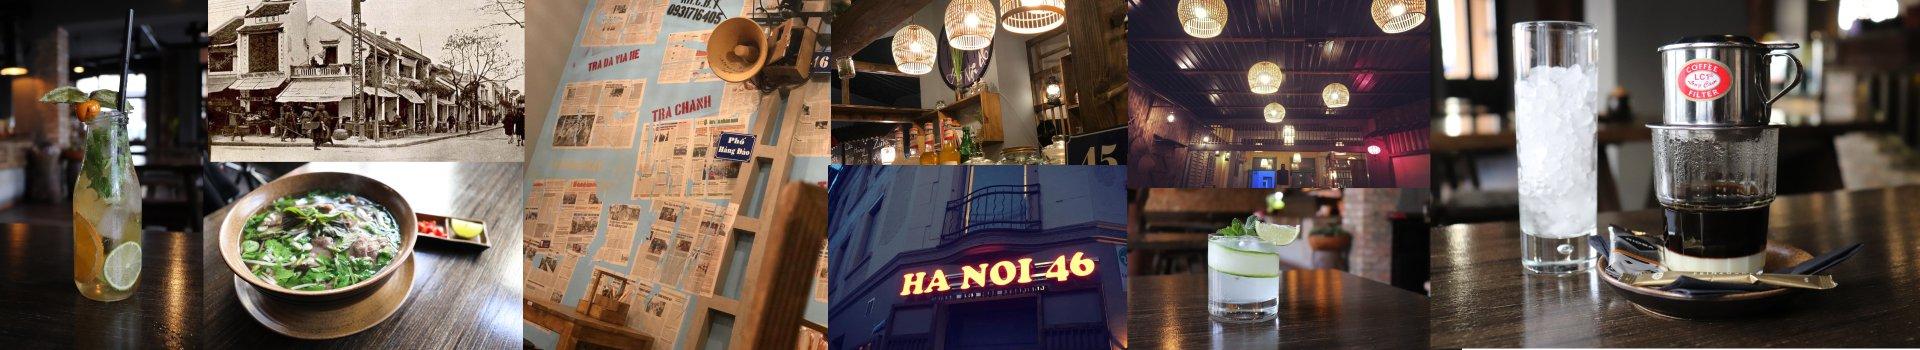 hanoi46